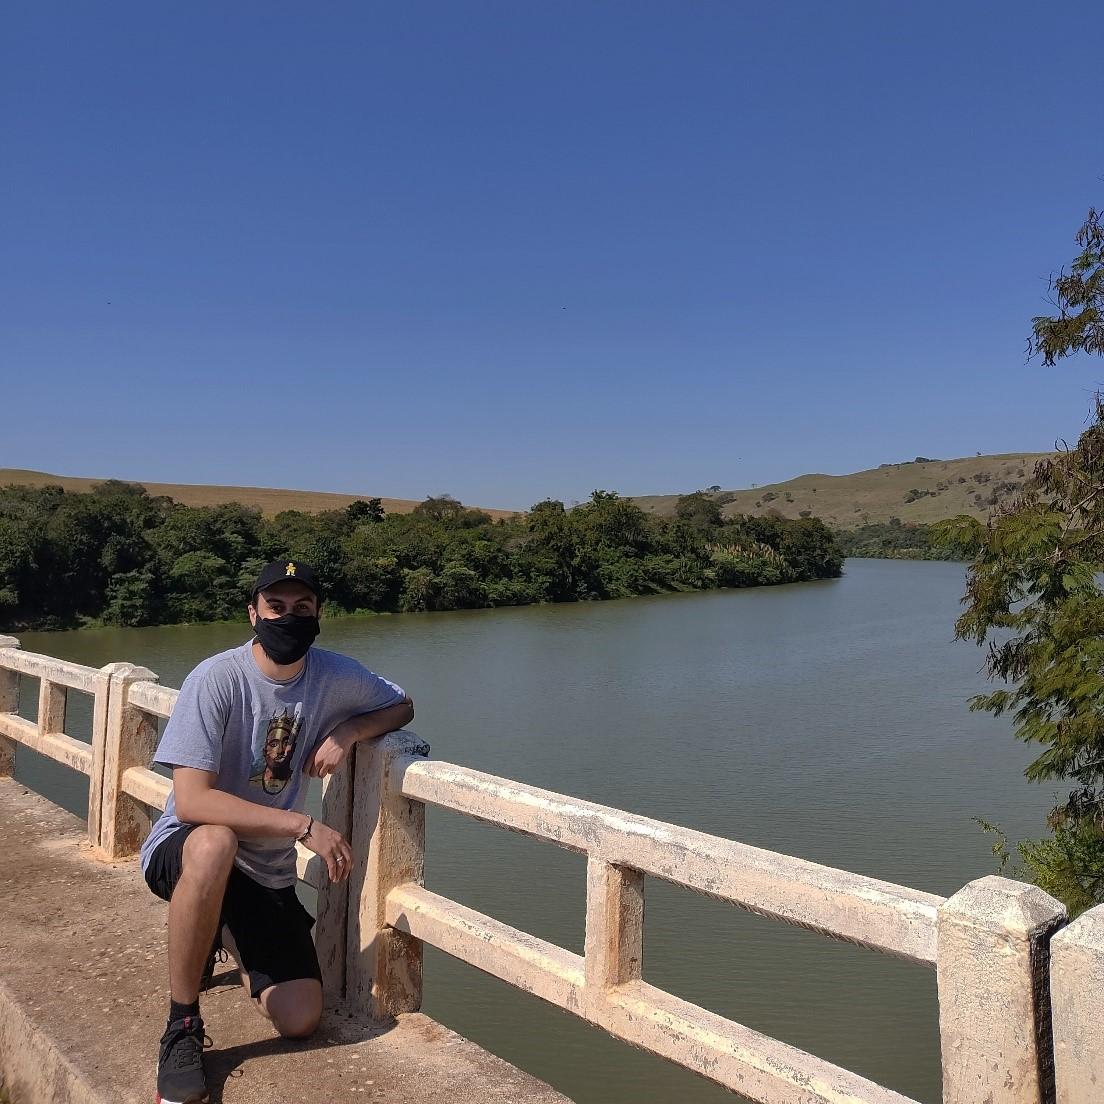 Rio Ivaí (Ivaí River)